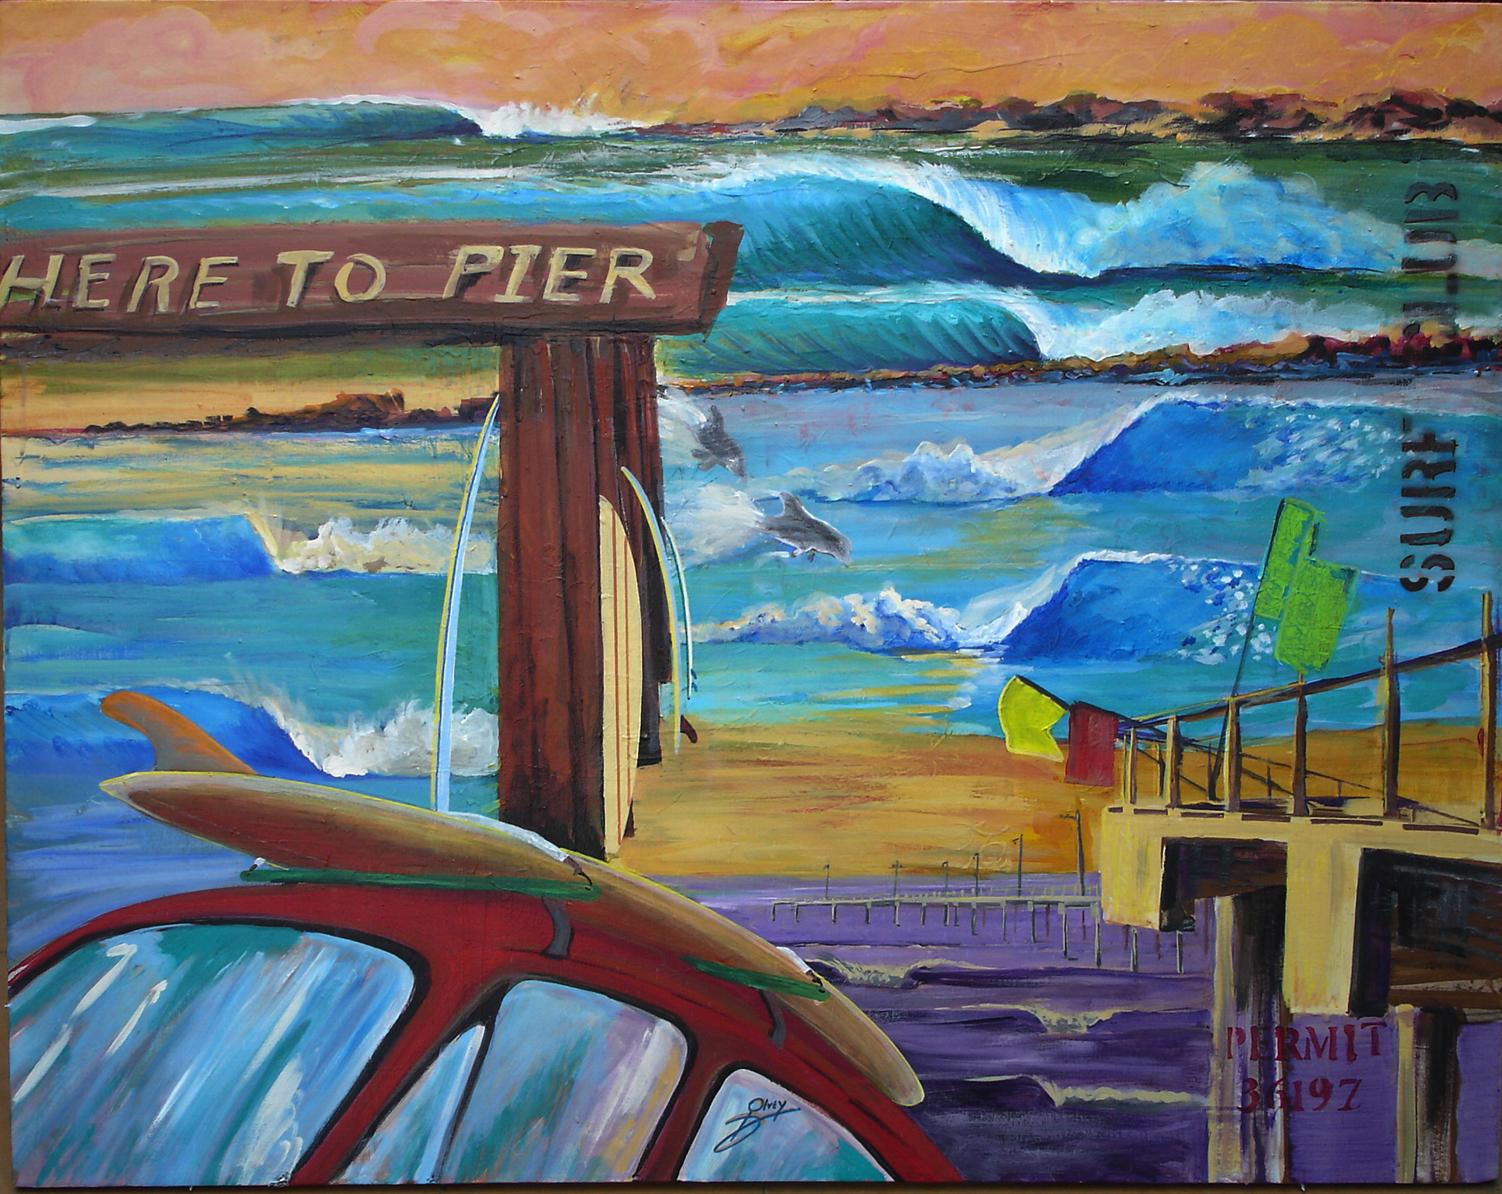 Here To Pier web.jpg